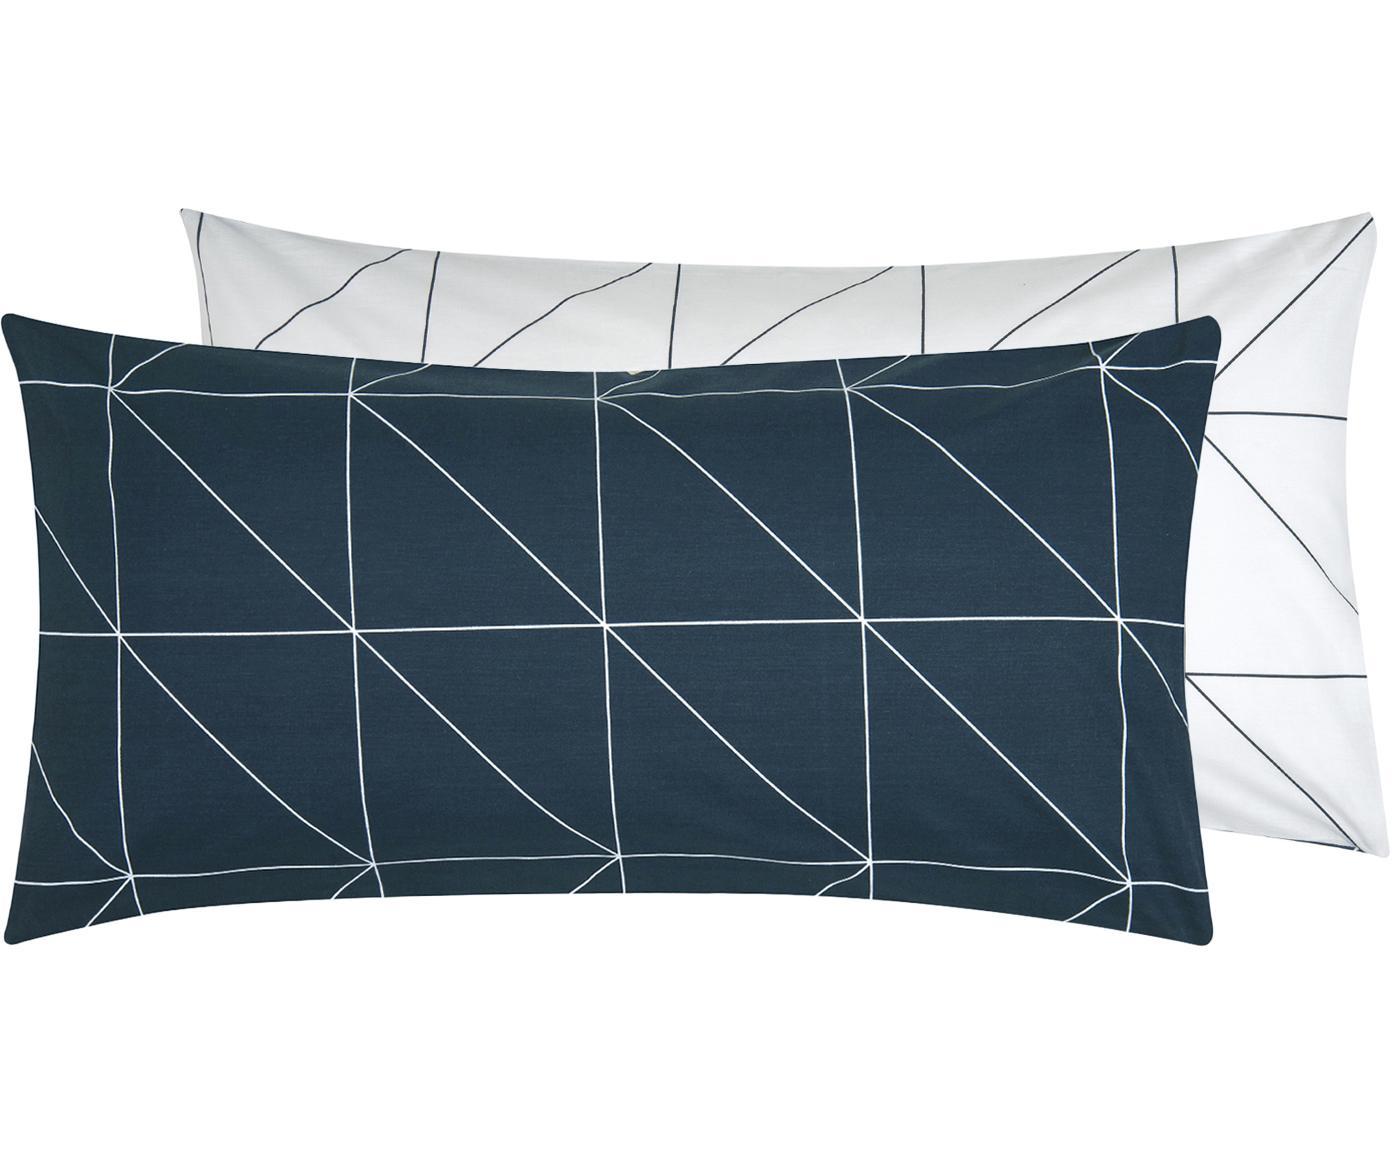 Funda de almohada de tejido renforcé Marla, caras distintas, Azul marino, blanco crema, An 45 x L 85 cm